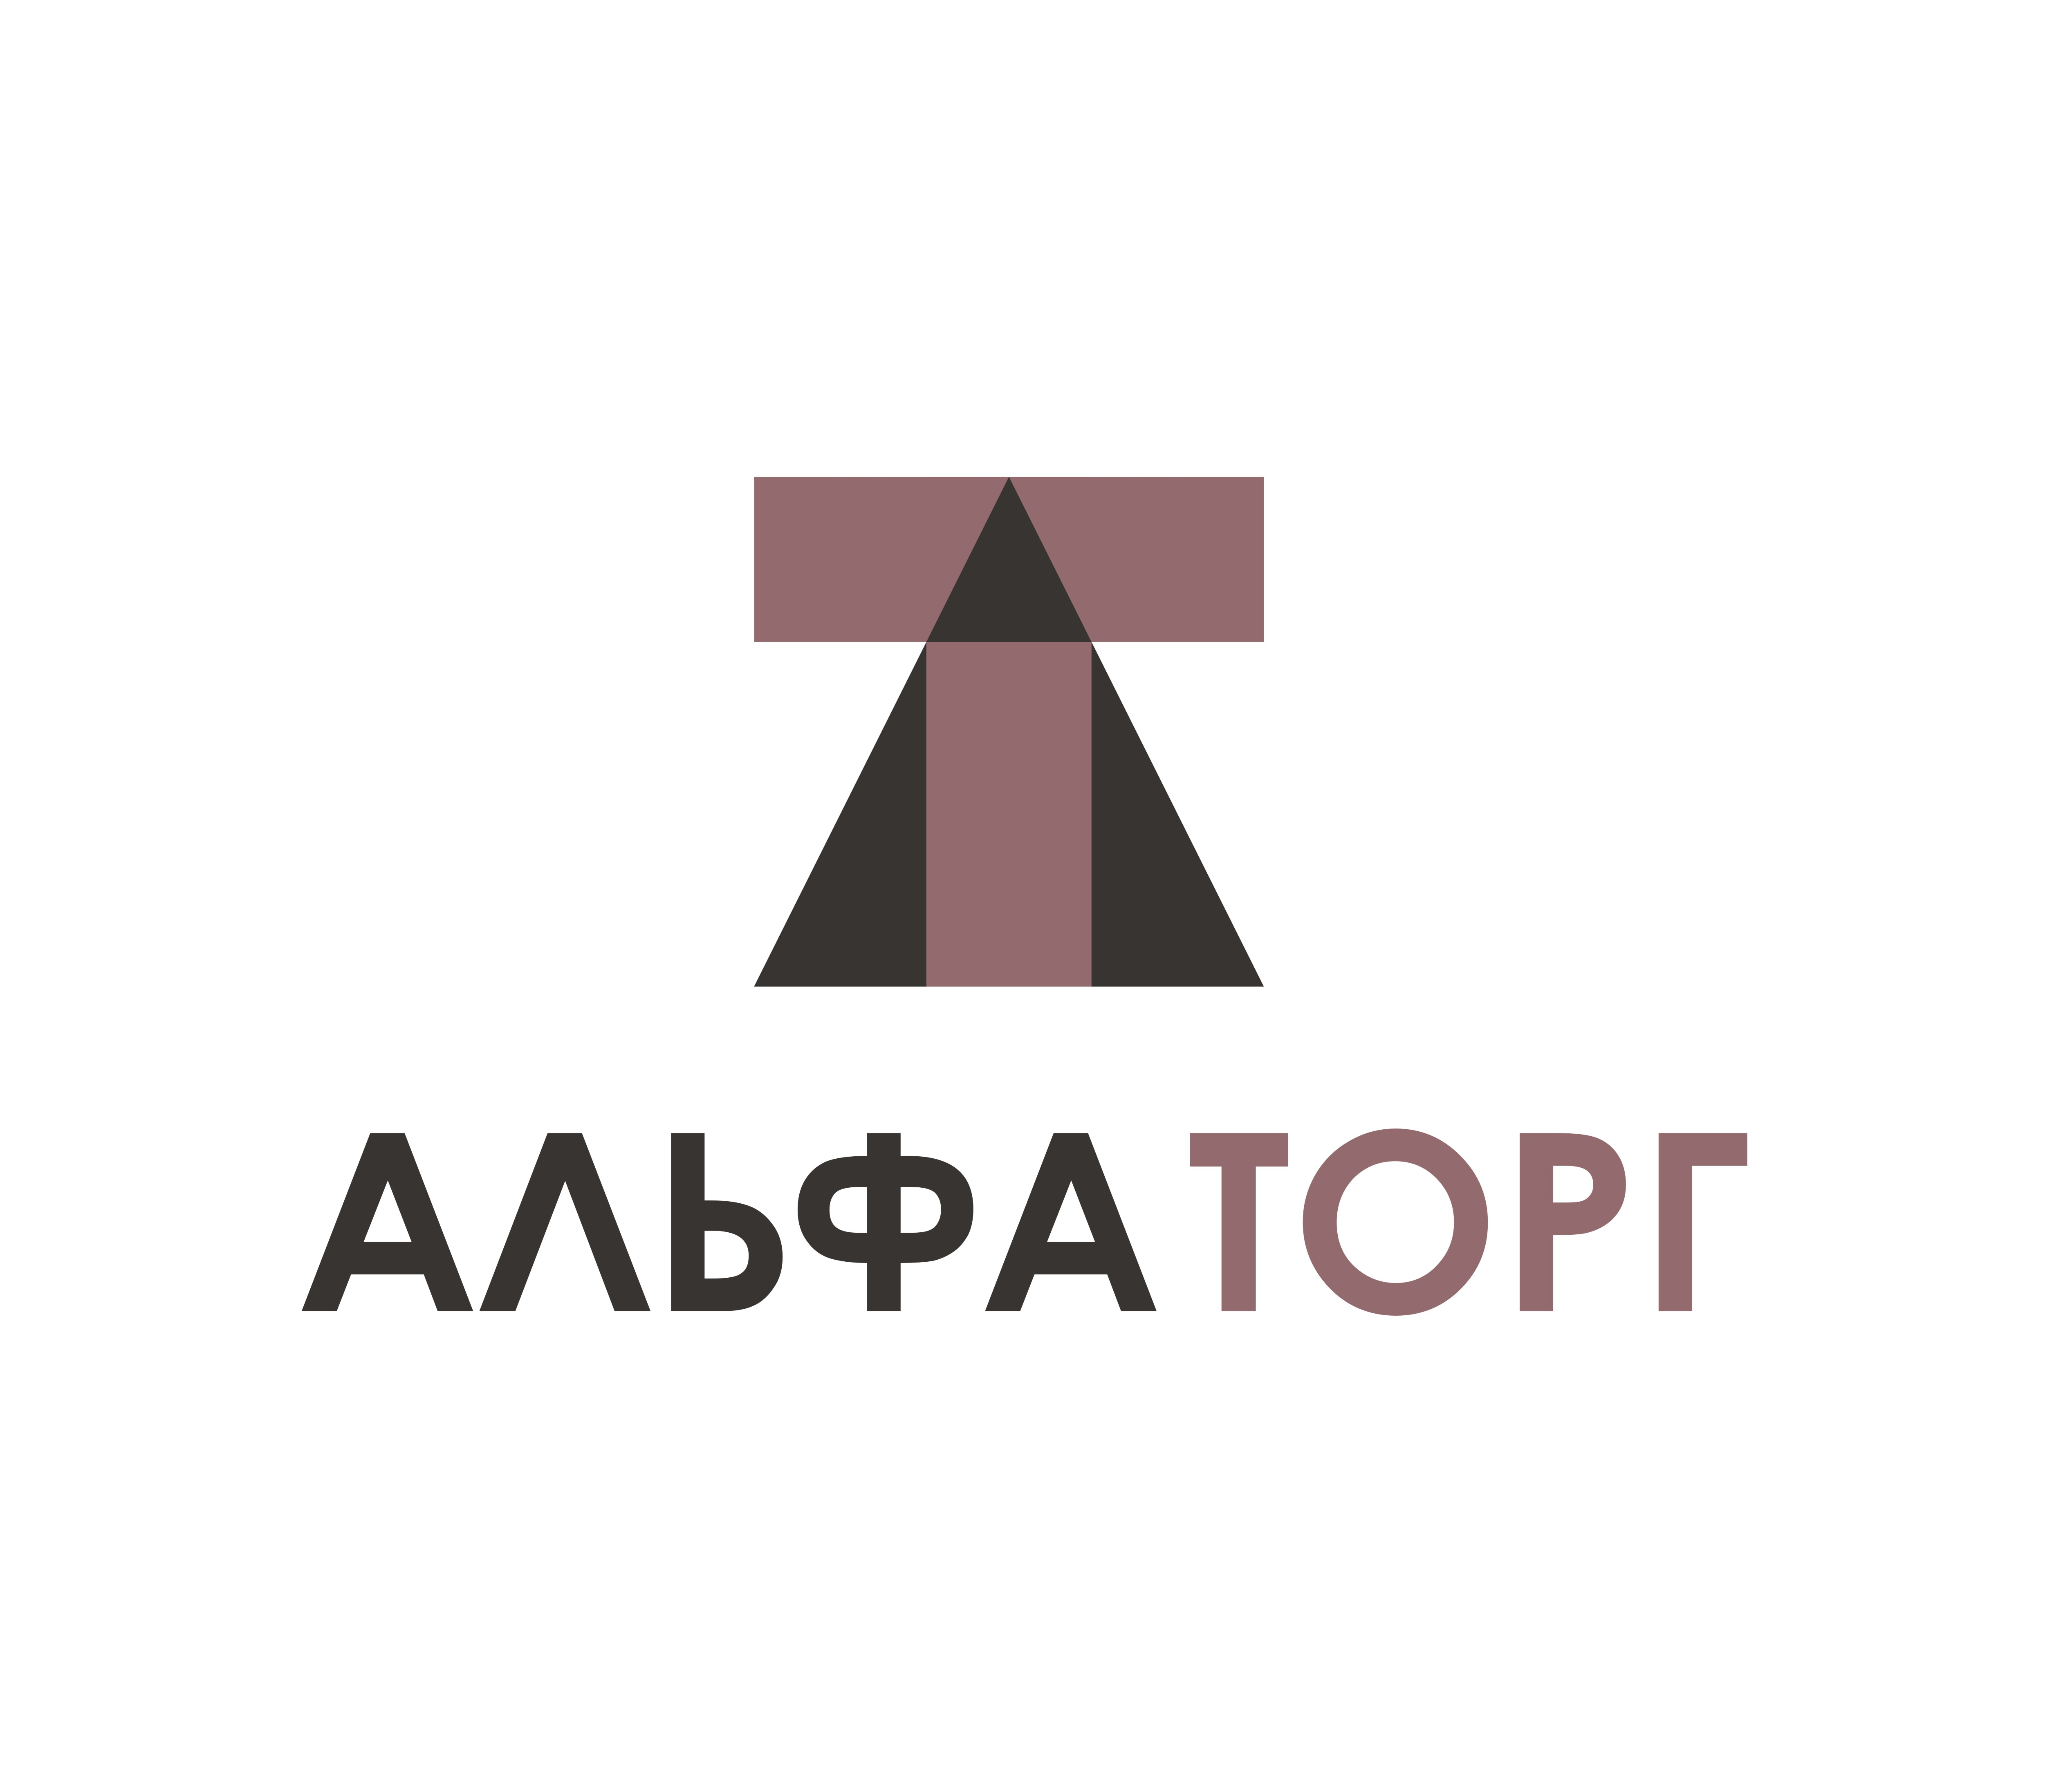 Логотип и фирменный стиль фото f_0675efccaa43dd45.jpg